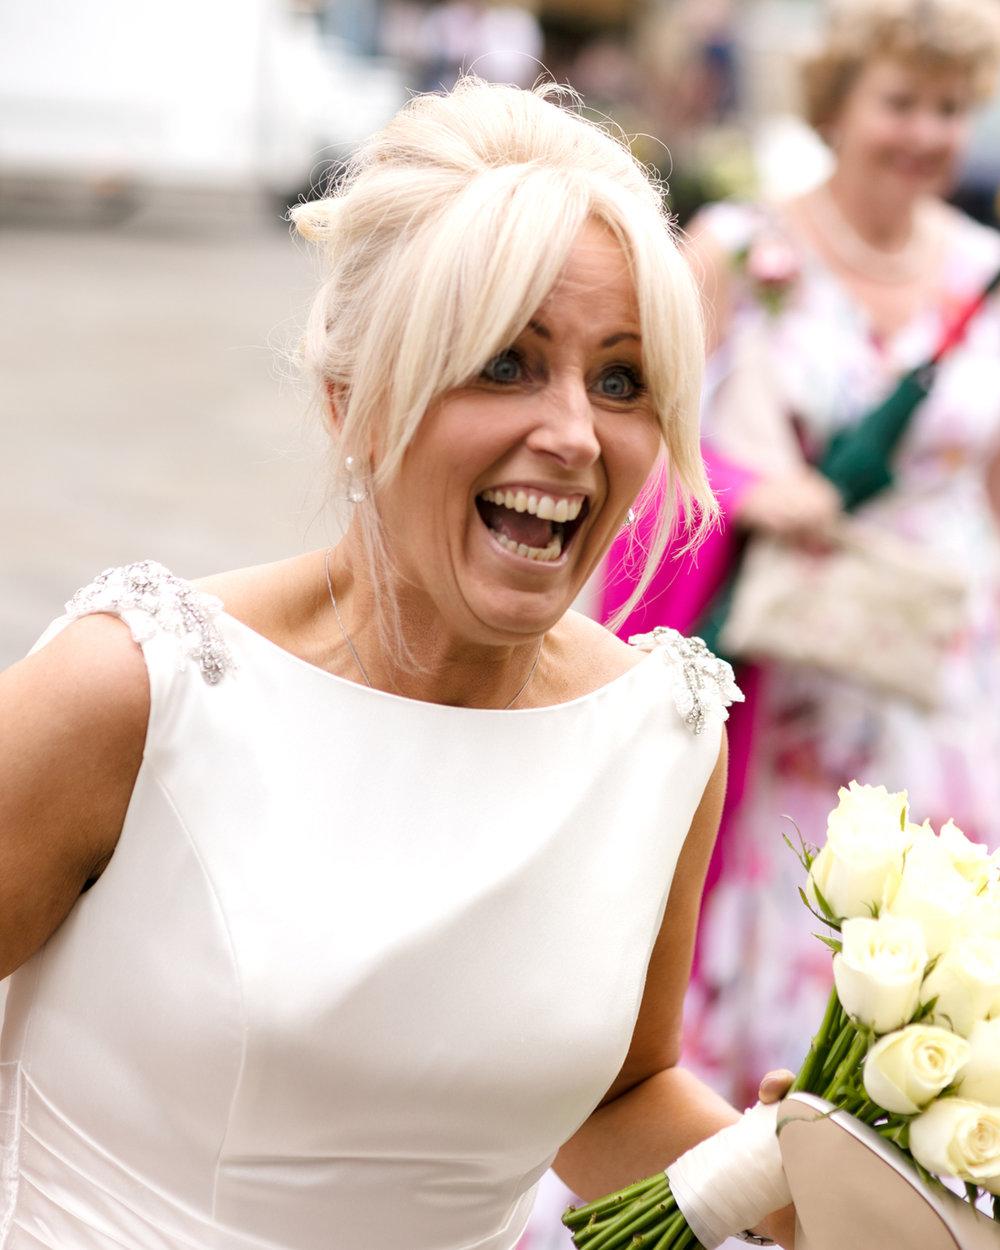 Wedding-Photography-Lord-Leycester-Hospital01.jpg